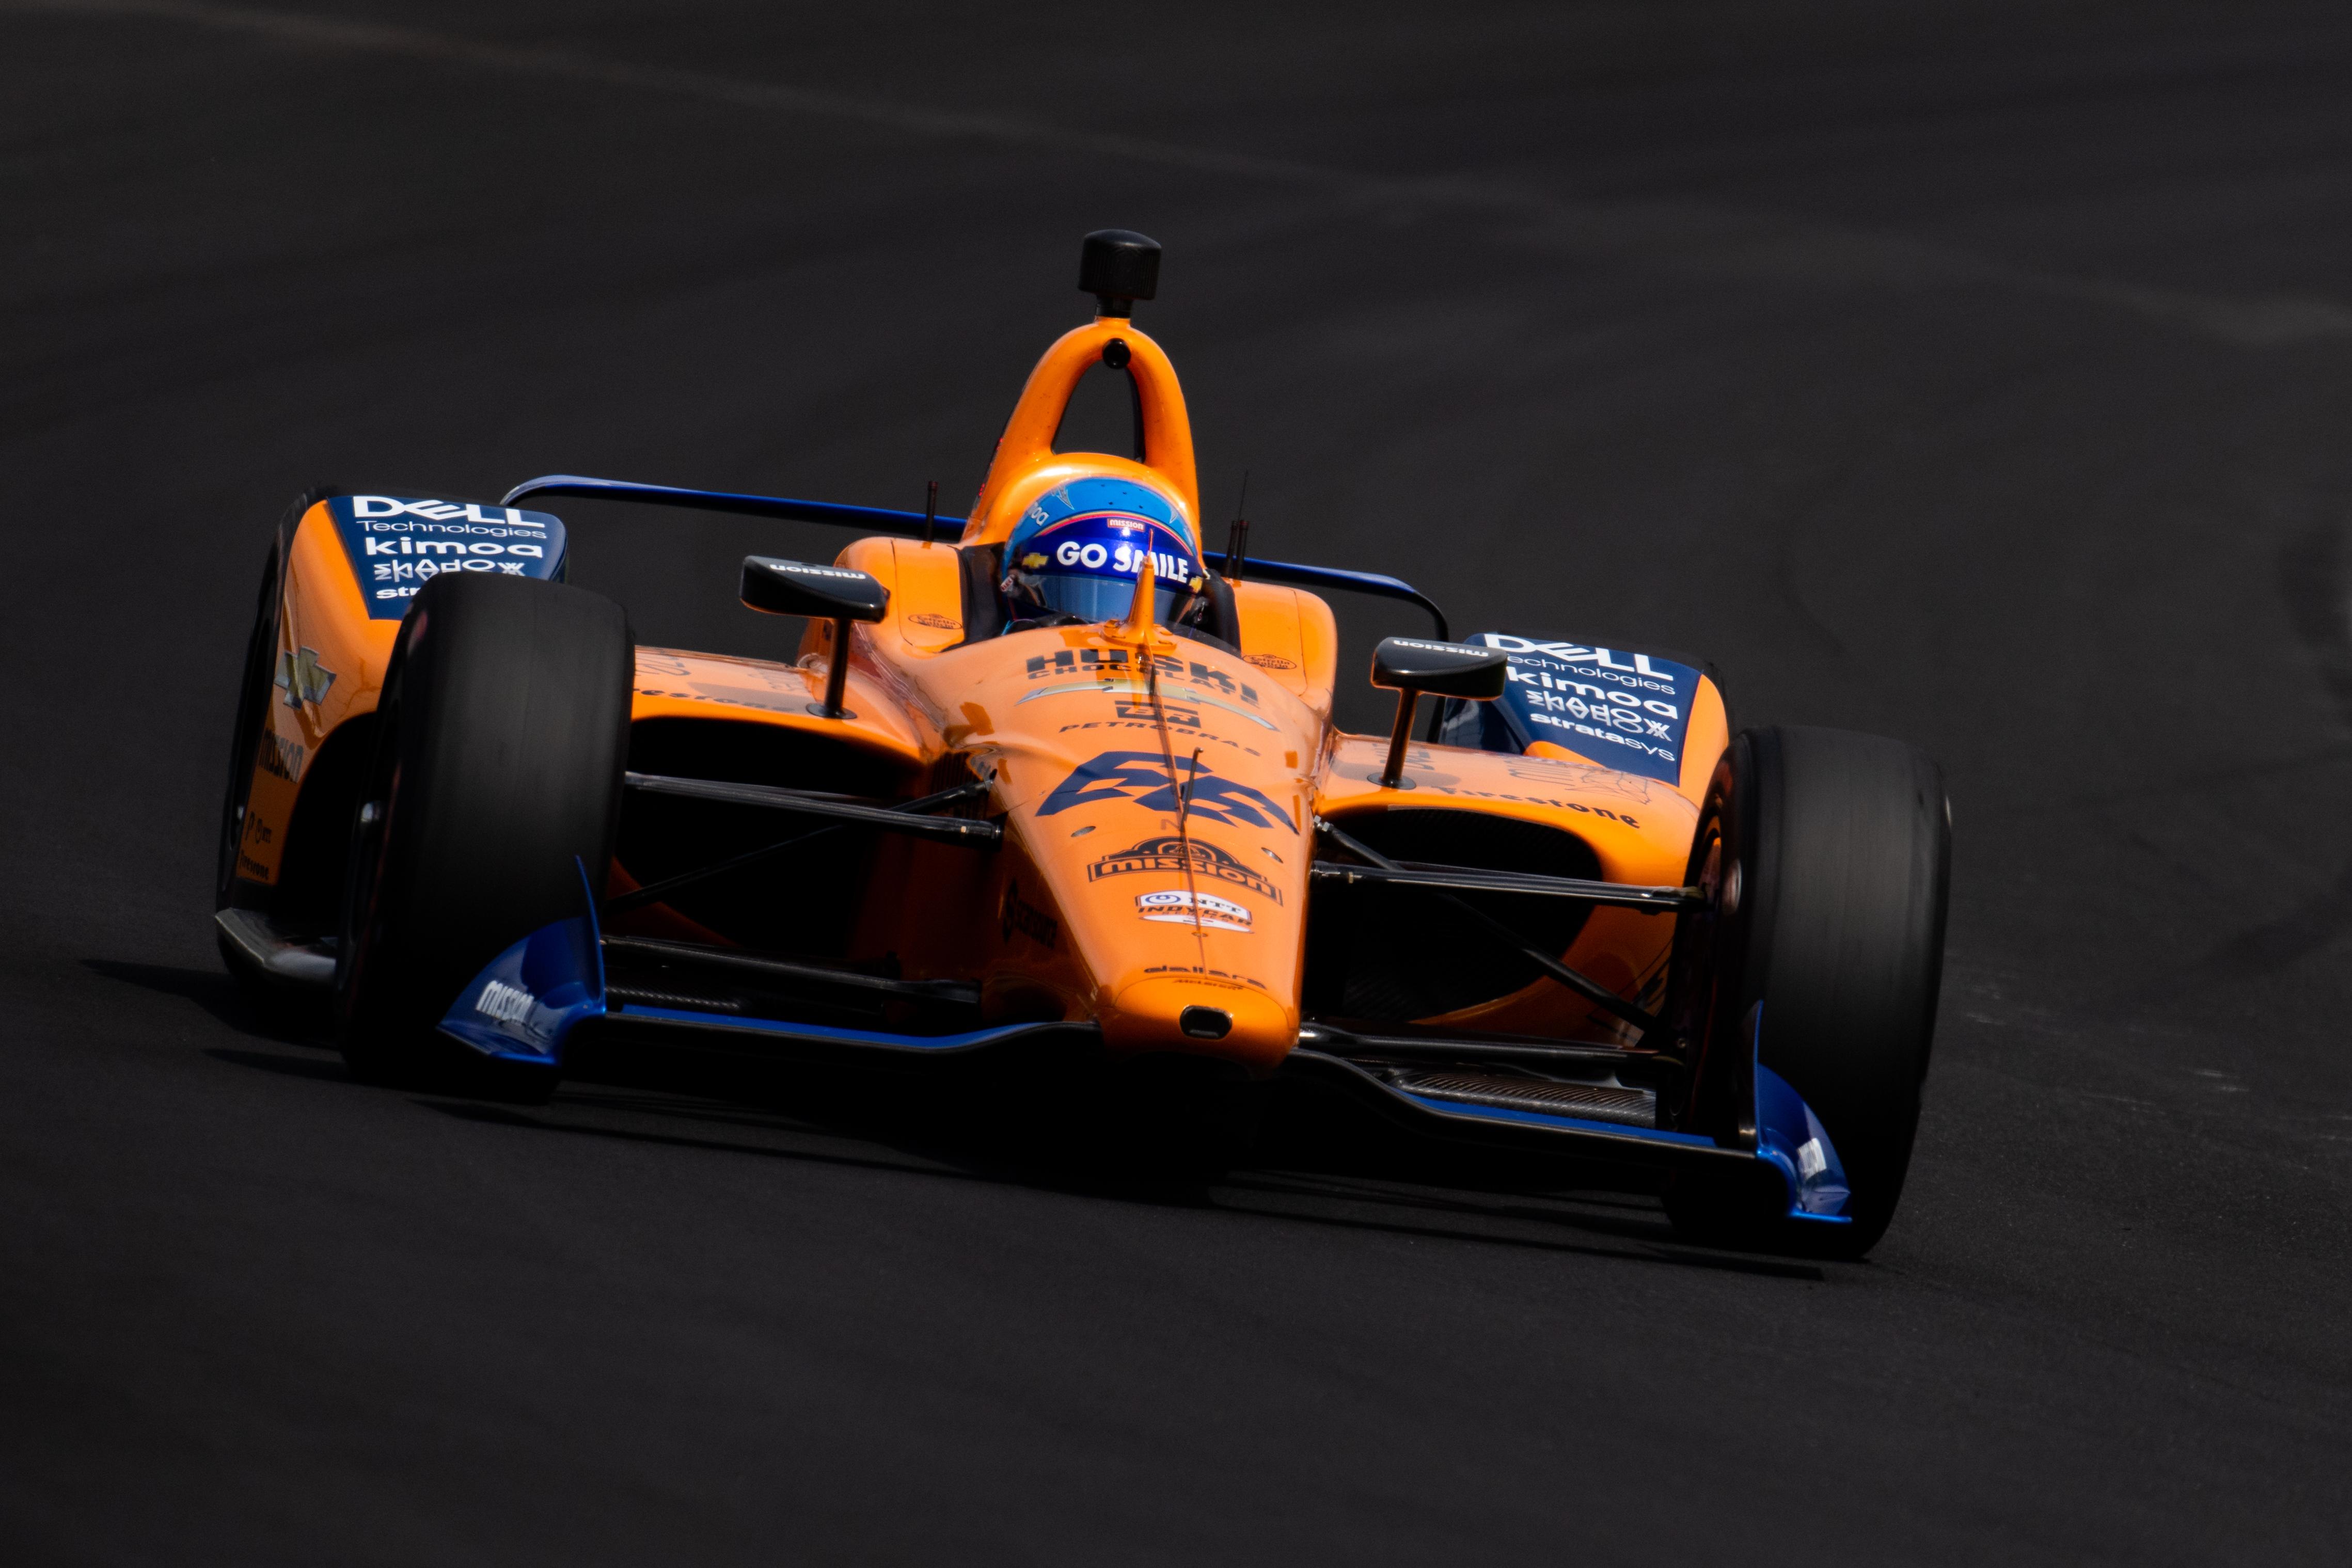 Fernando Alonso - Indy 500 McLaren